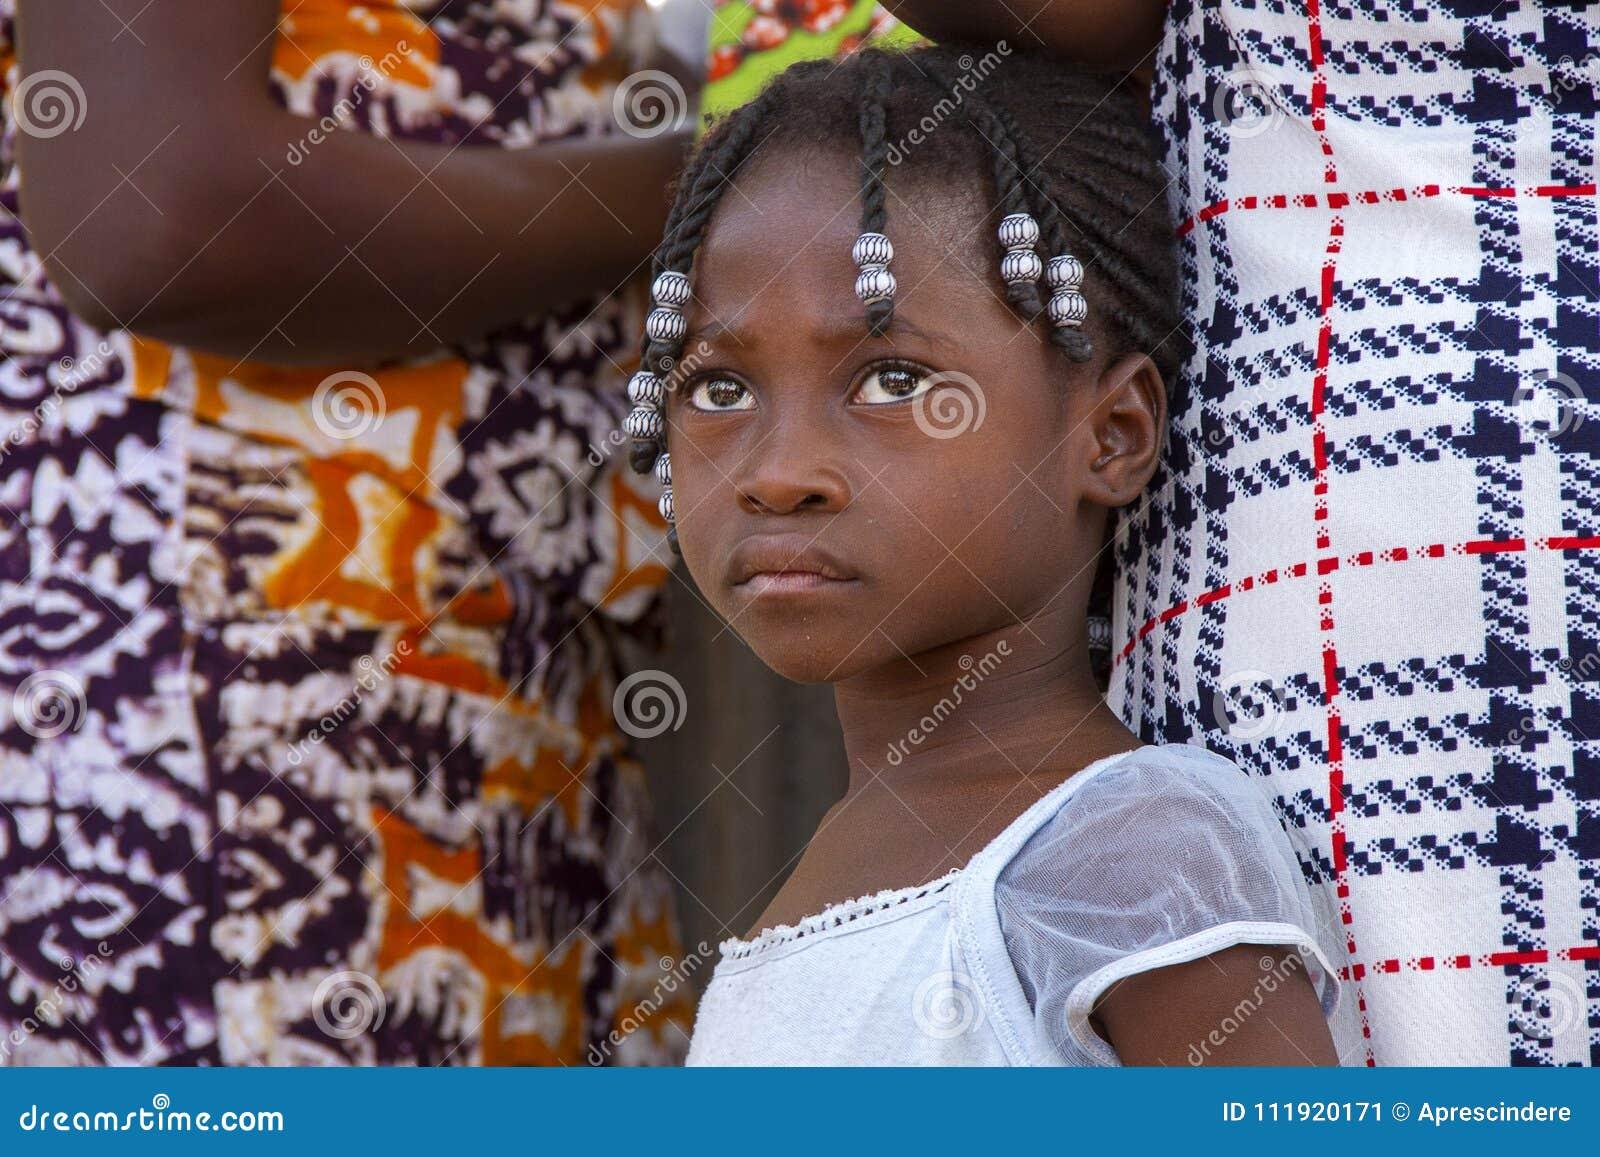 Ghana girls thumbs